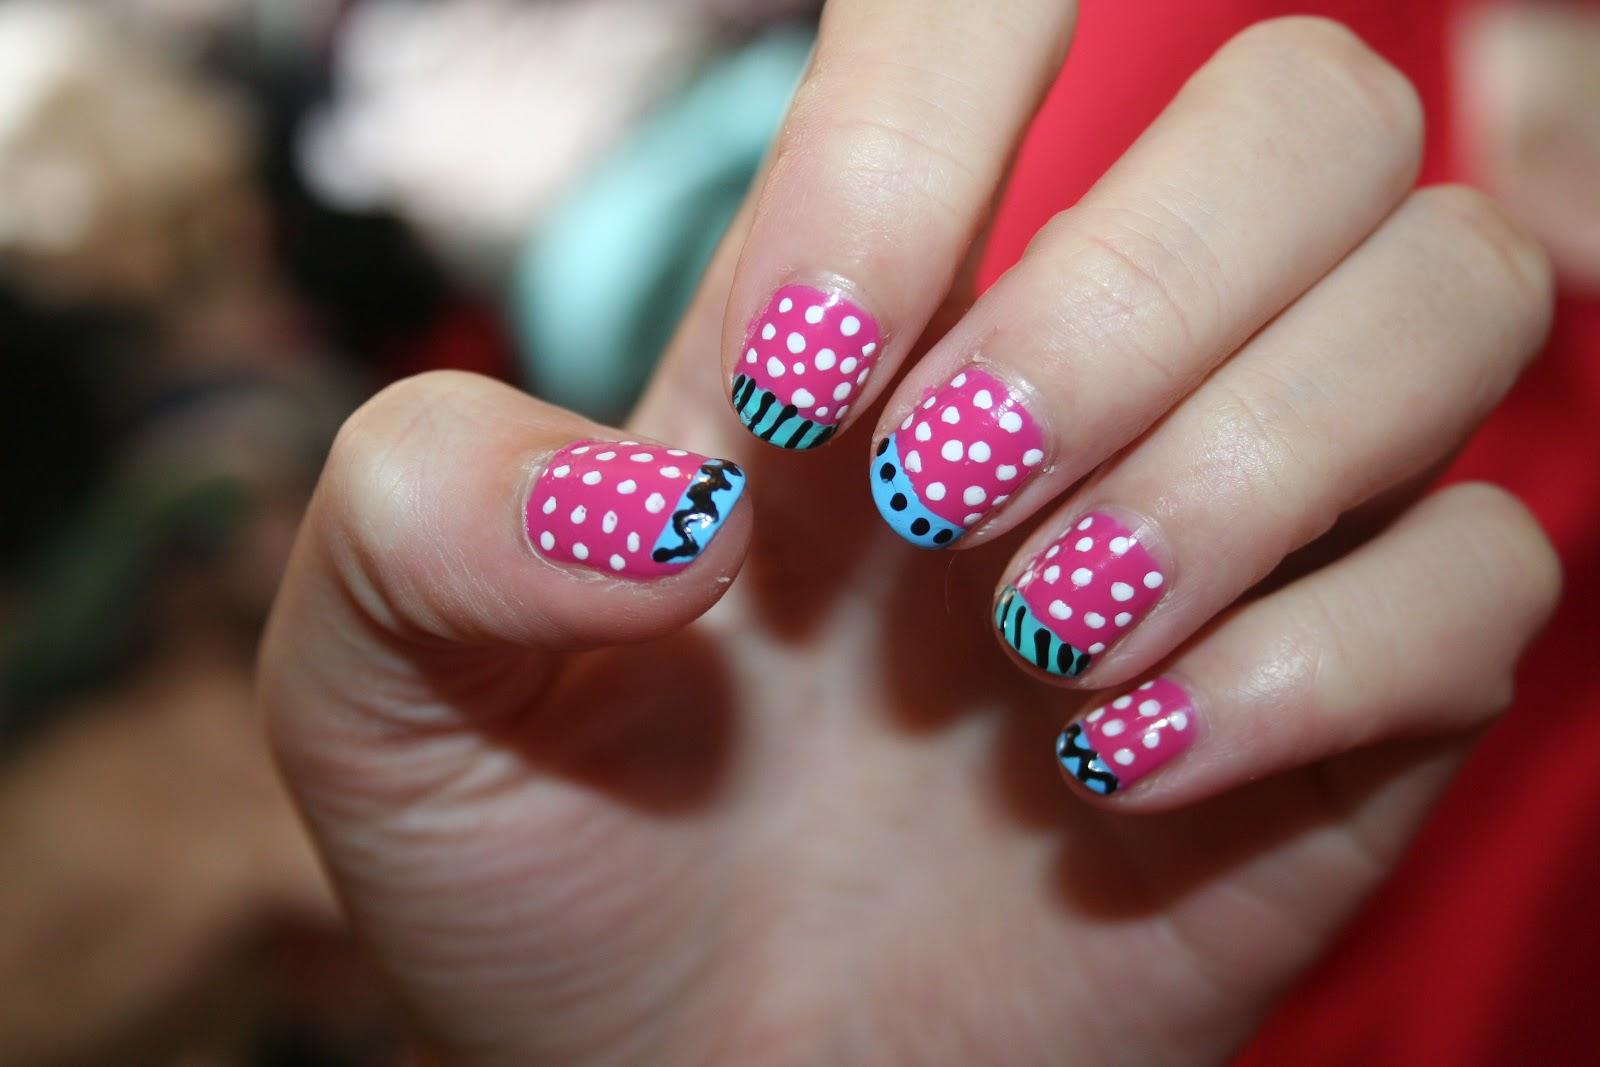 Handee Nail Tips Pop Art Nails